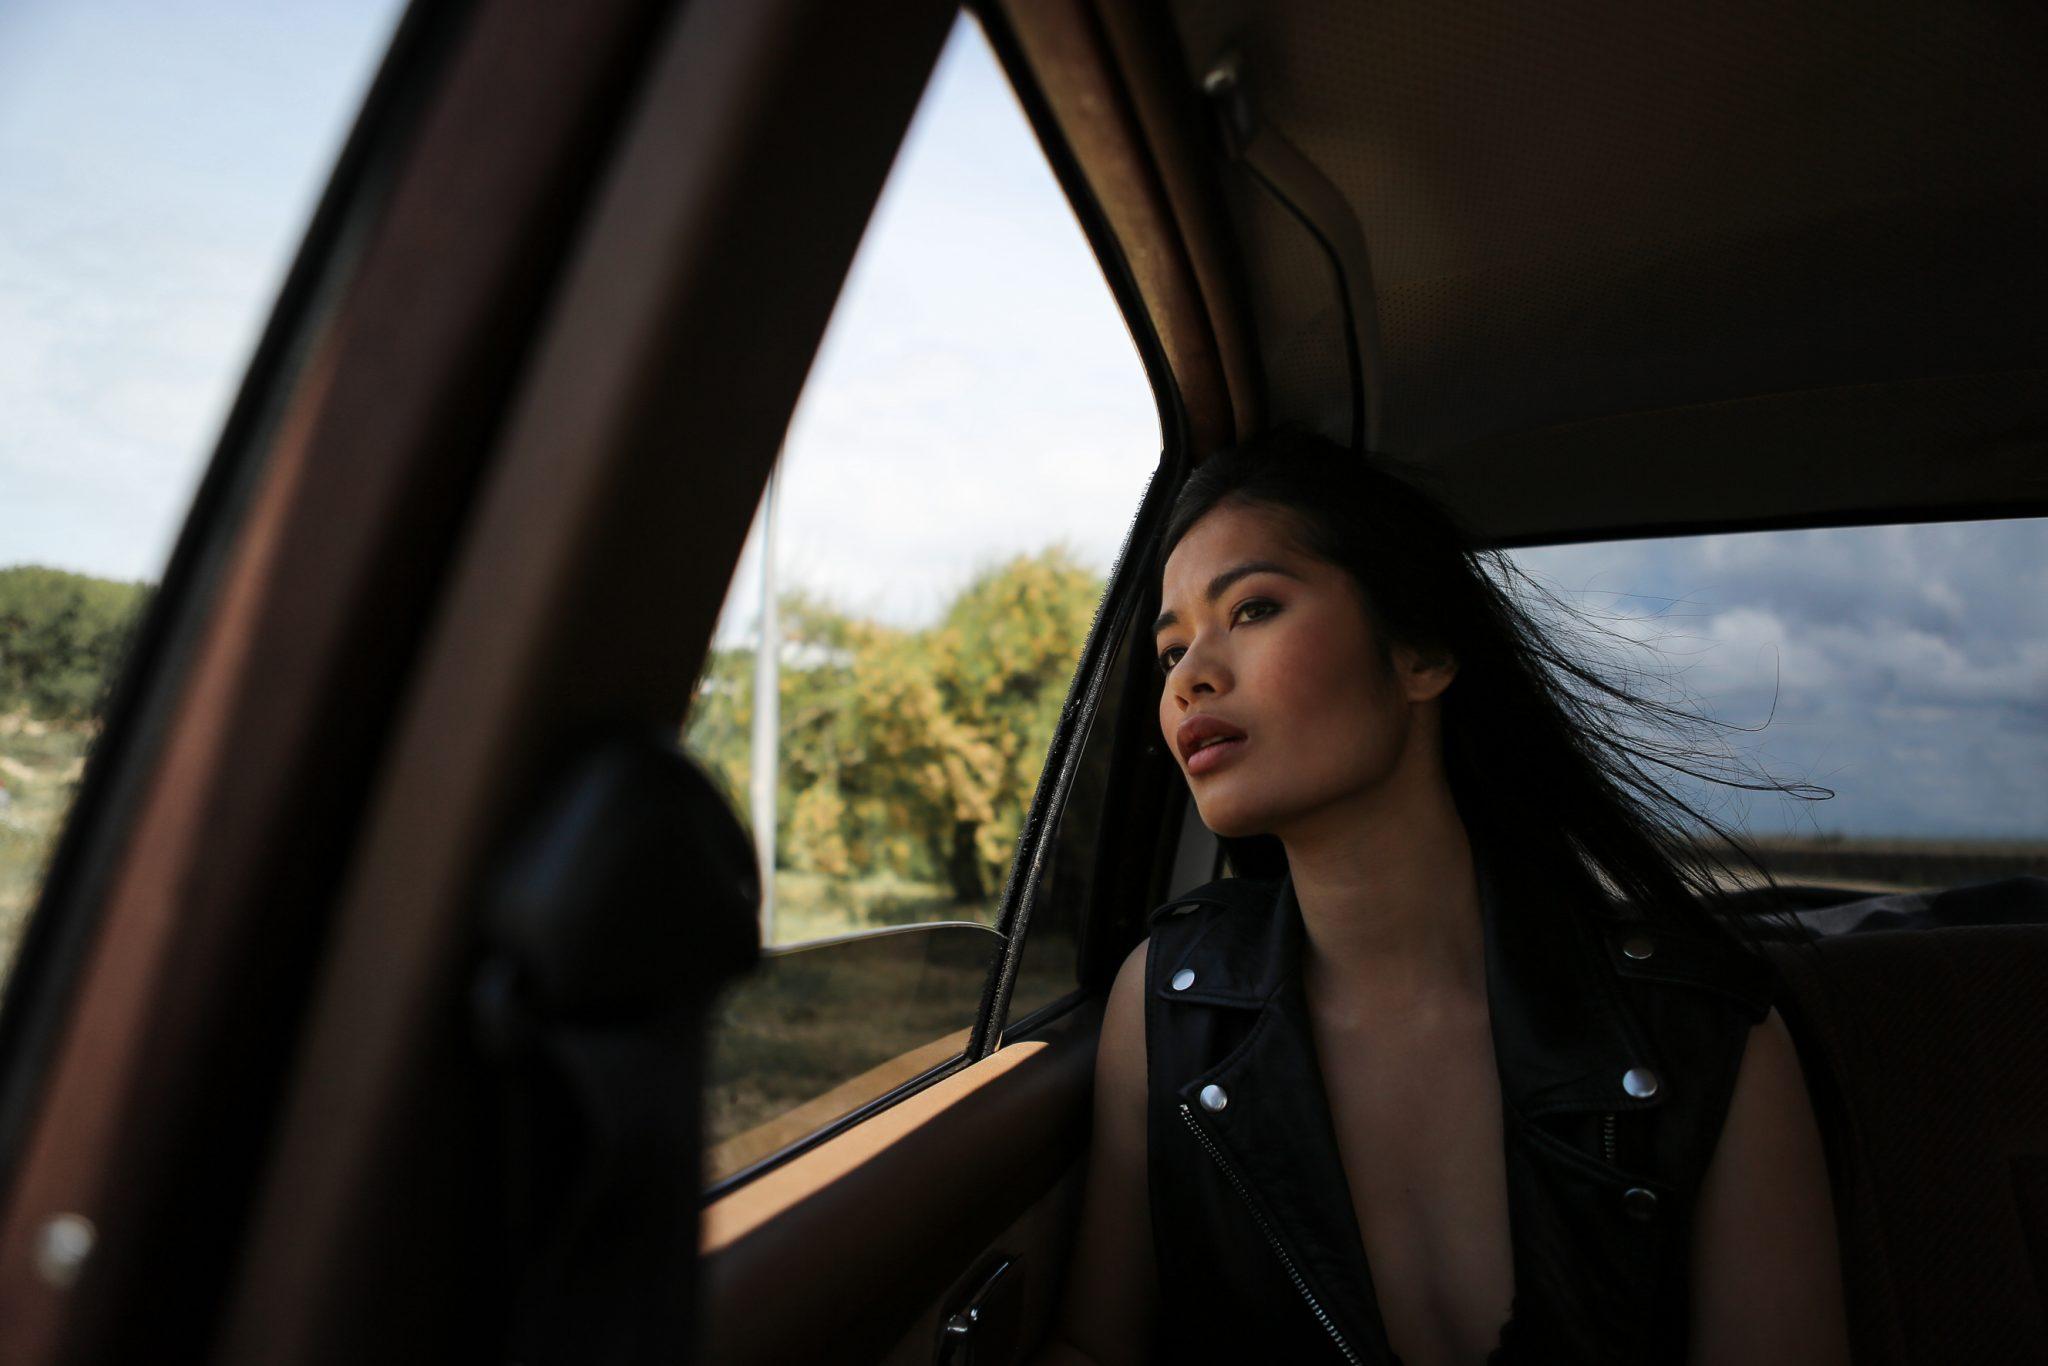 fake heaven fashion story editorial lily renee le dernier etage magazine webzine